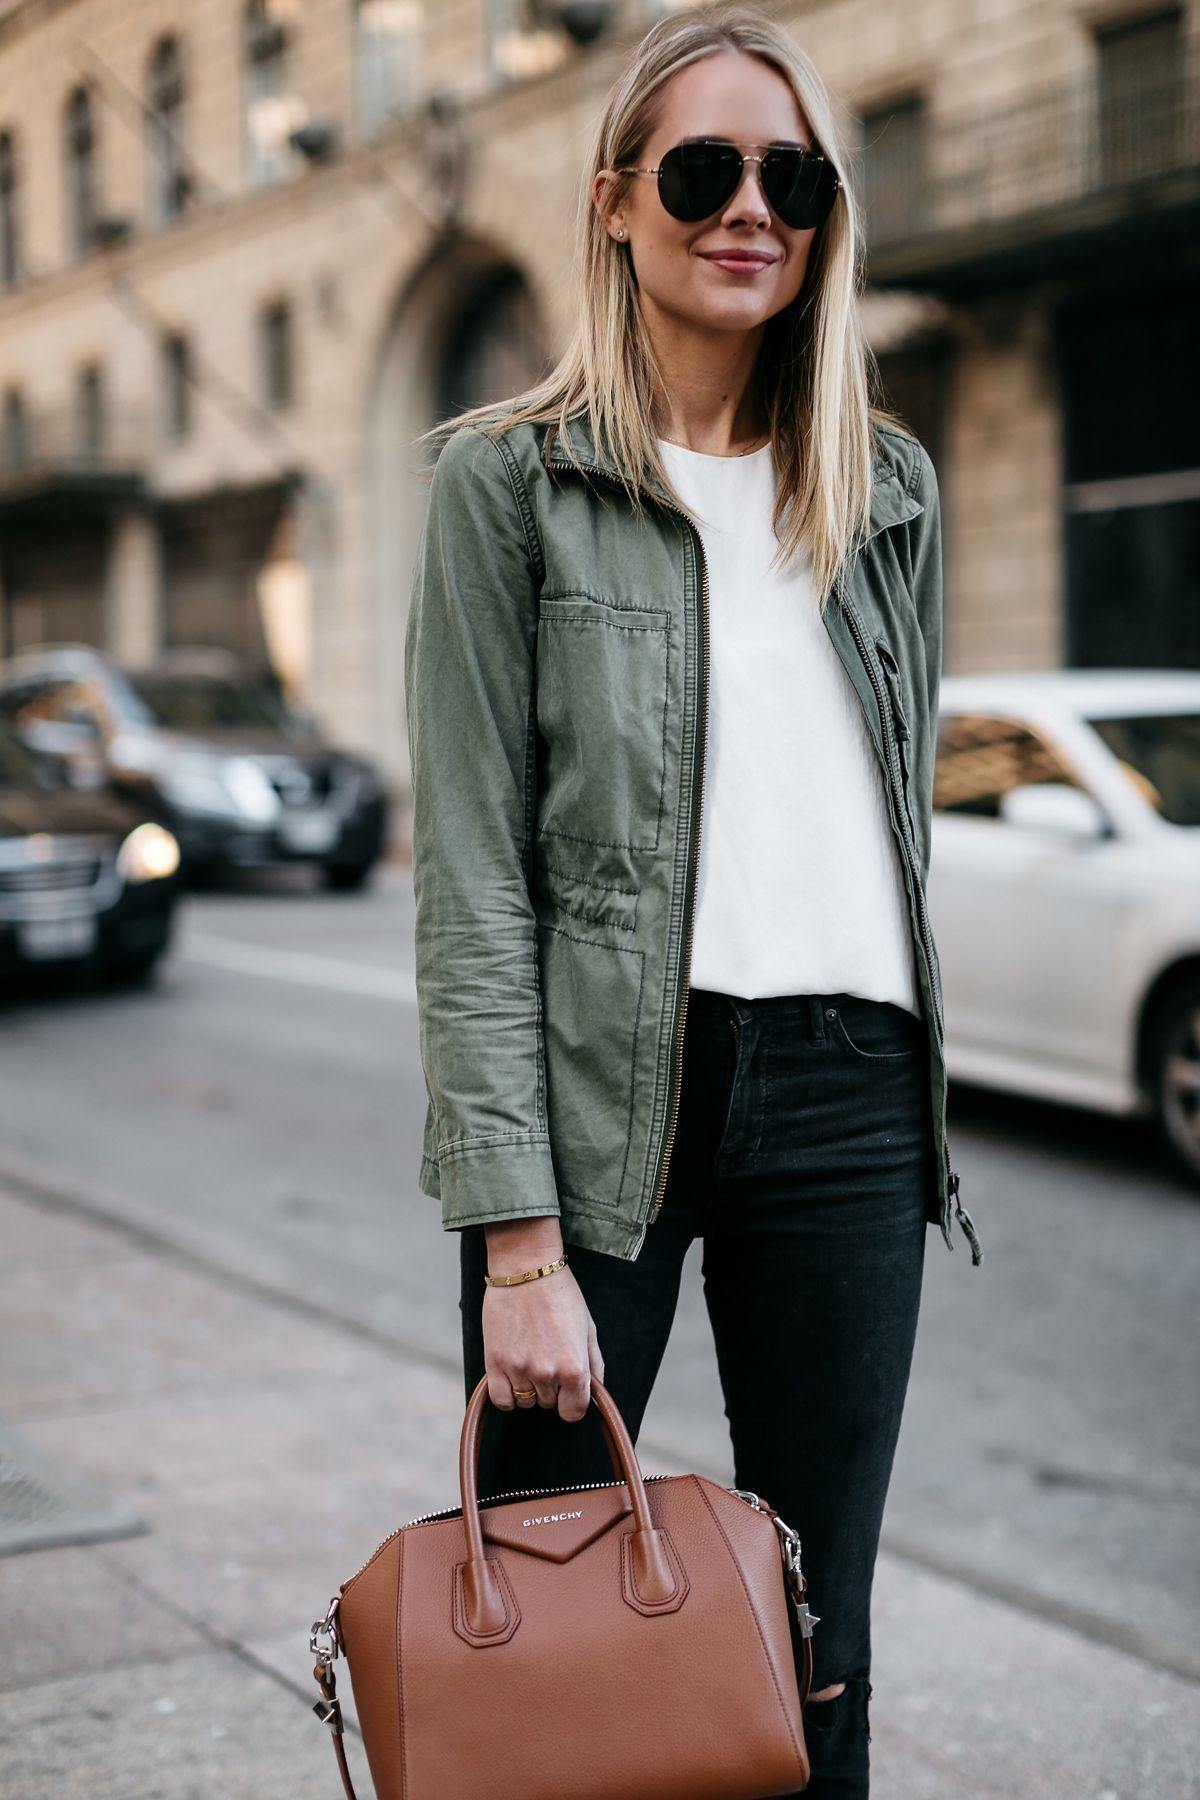 c5b6fd6ec7f0 ... Green Jacket White Tank Givenchy Antigona Small Satchel Cognac Celine  Aviator Sunglasses Fashion Jackson Dallas Blogger Fashion Blogger Street  Style